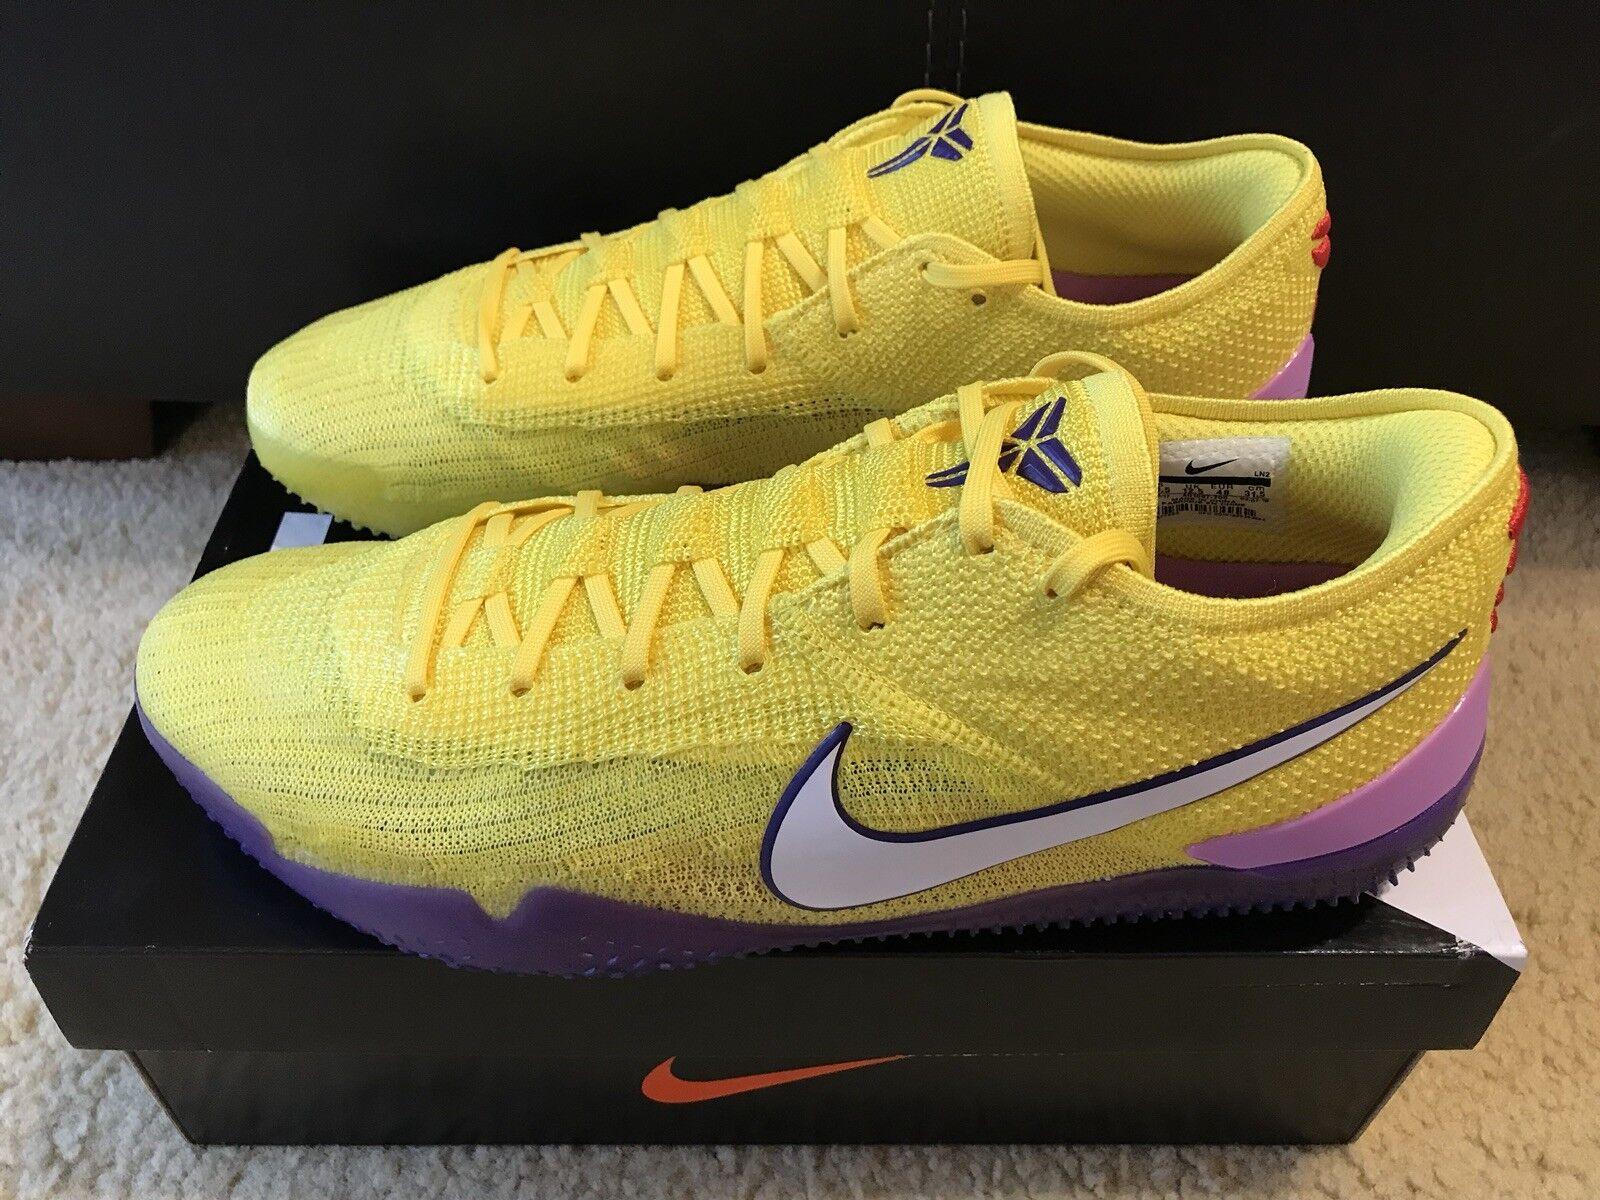 meet df951 0e019 Nike Nike Nike Kobe AD NXT 360 MAMBA LAKERS Men s sz 13.5 Yellow Strike  White AQ1087